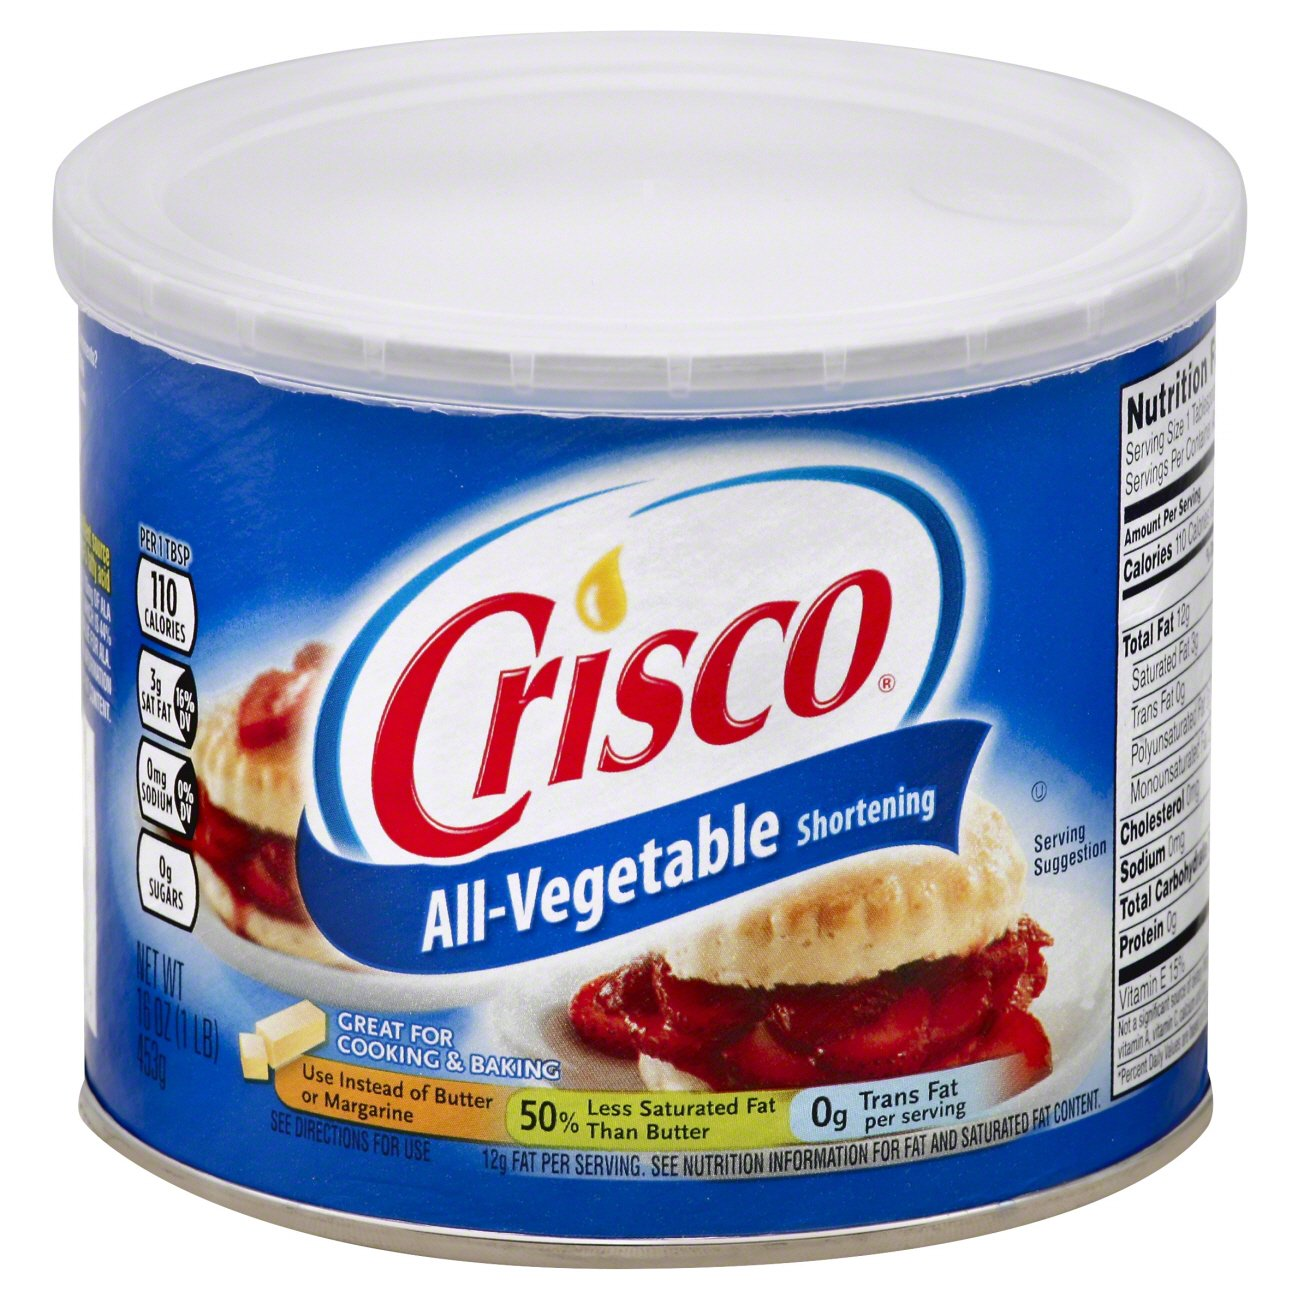 Crisco All‑Vegetable Shortening ‑ Shop Butter & Margarine at H‑E‑B